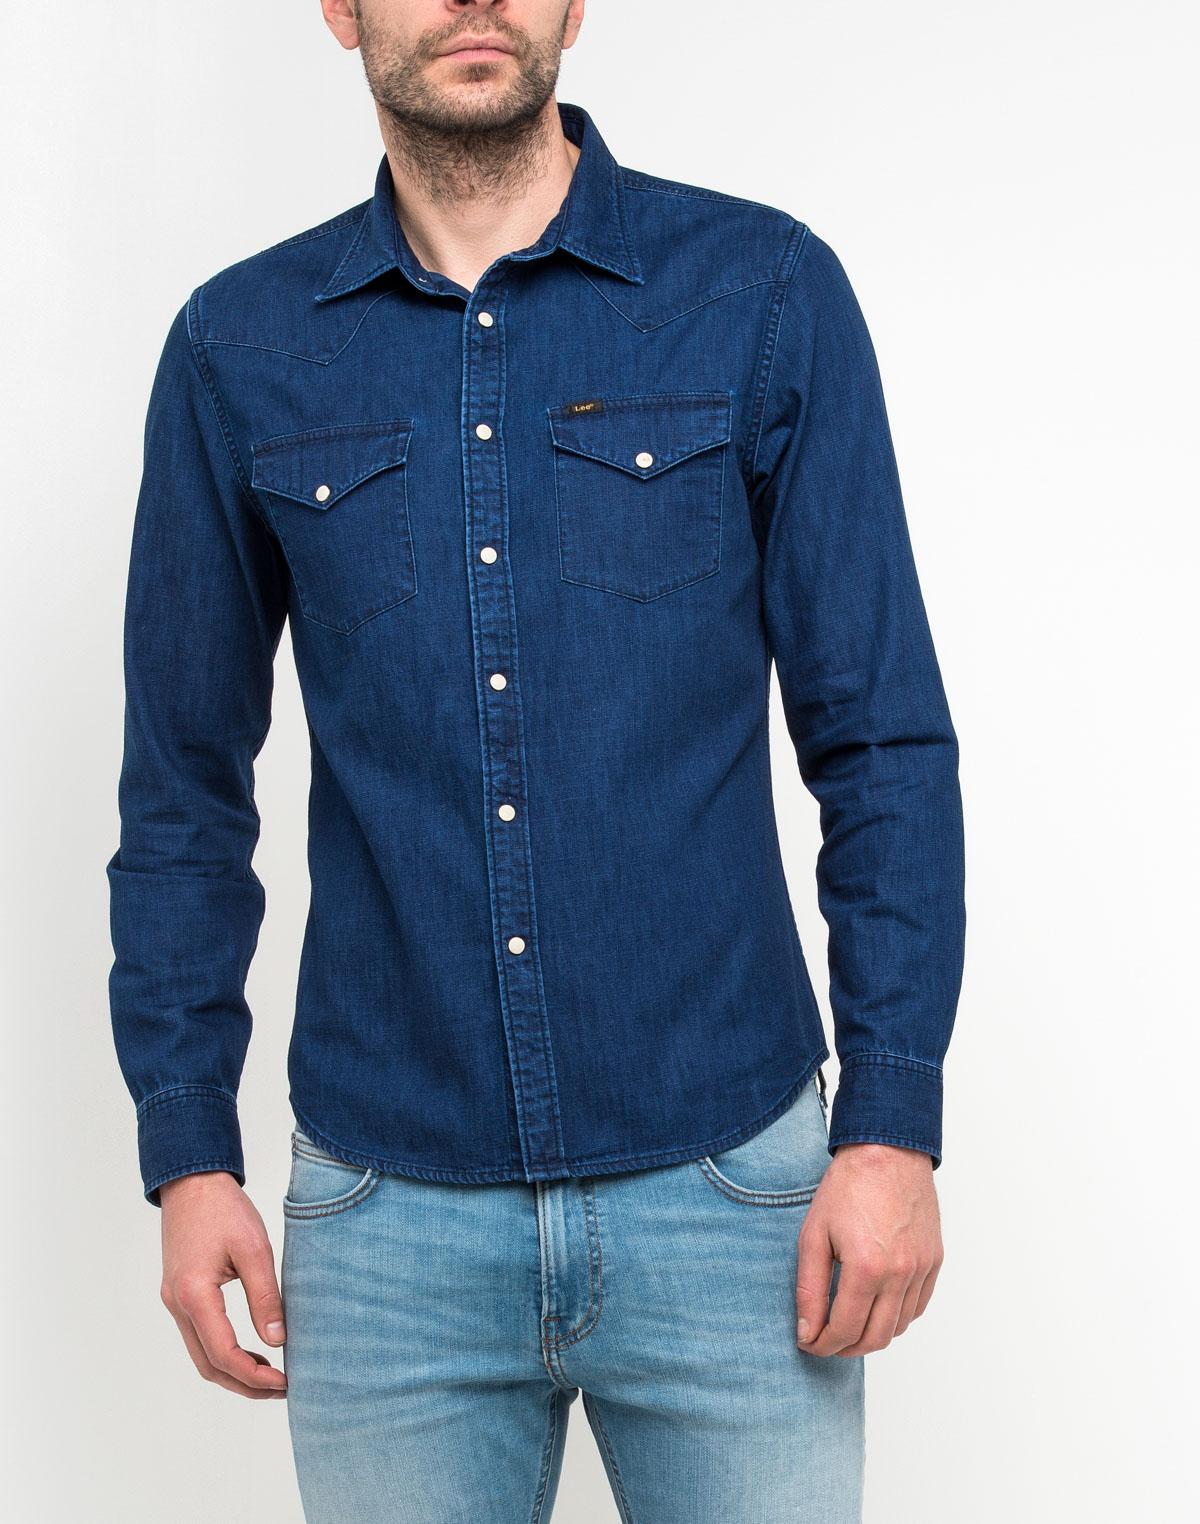 Рубашка Lee рубашка мужская lee цвет синий l643pllh размер s 46